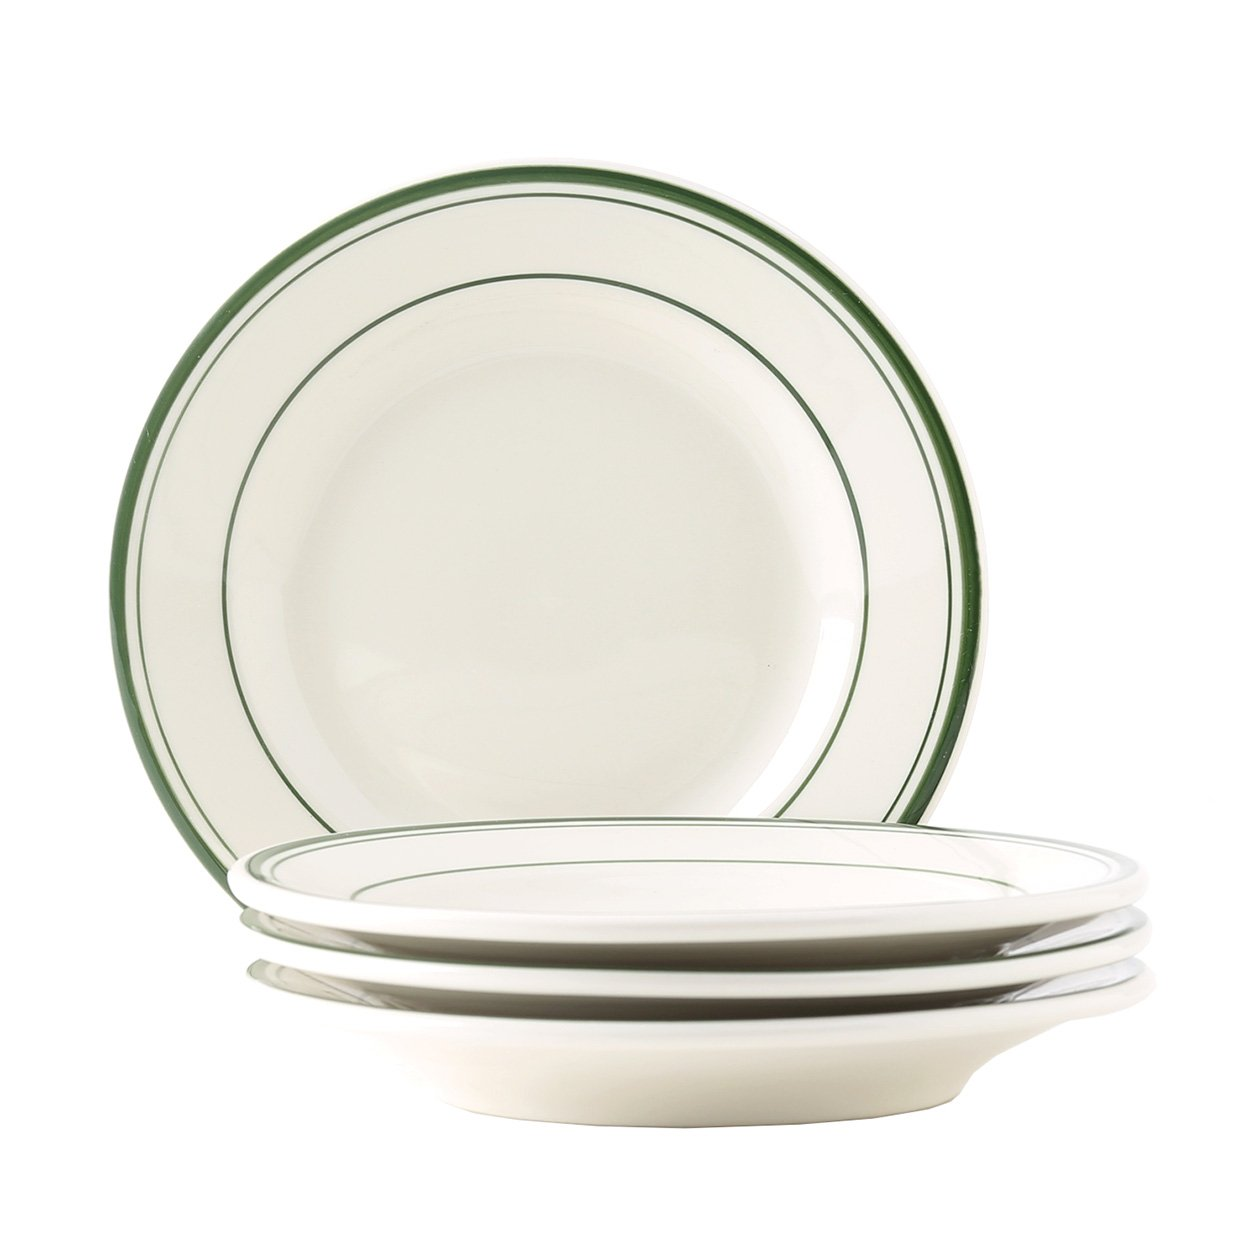 Stripe Tuxton Home THTGB007-6B Green Bay Salad Plate 7-Inch